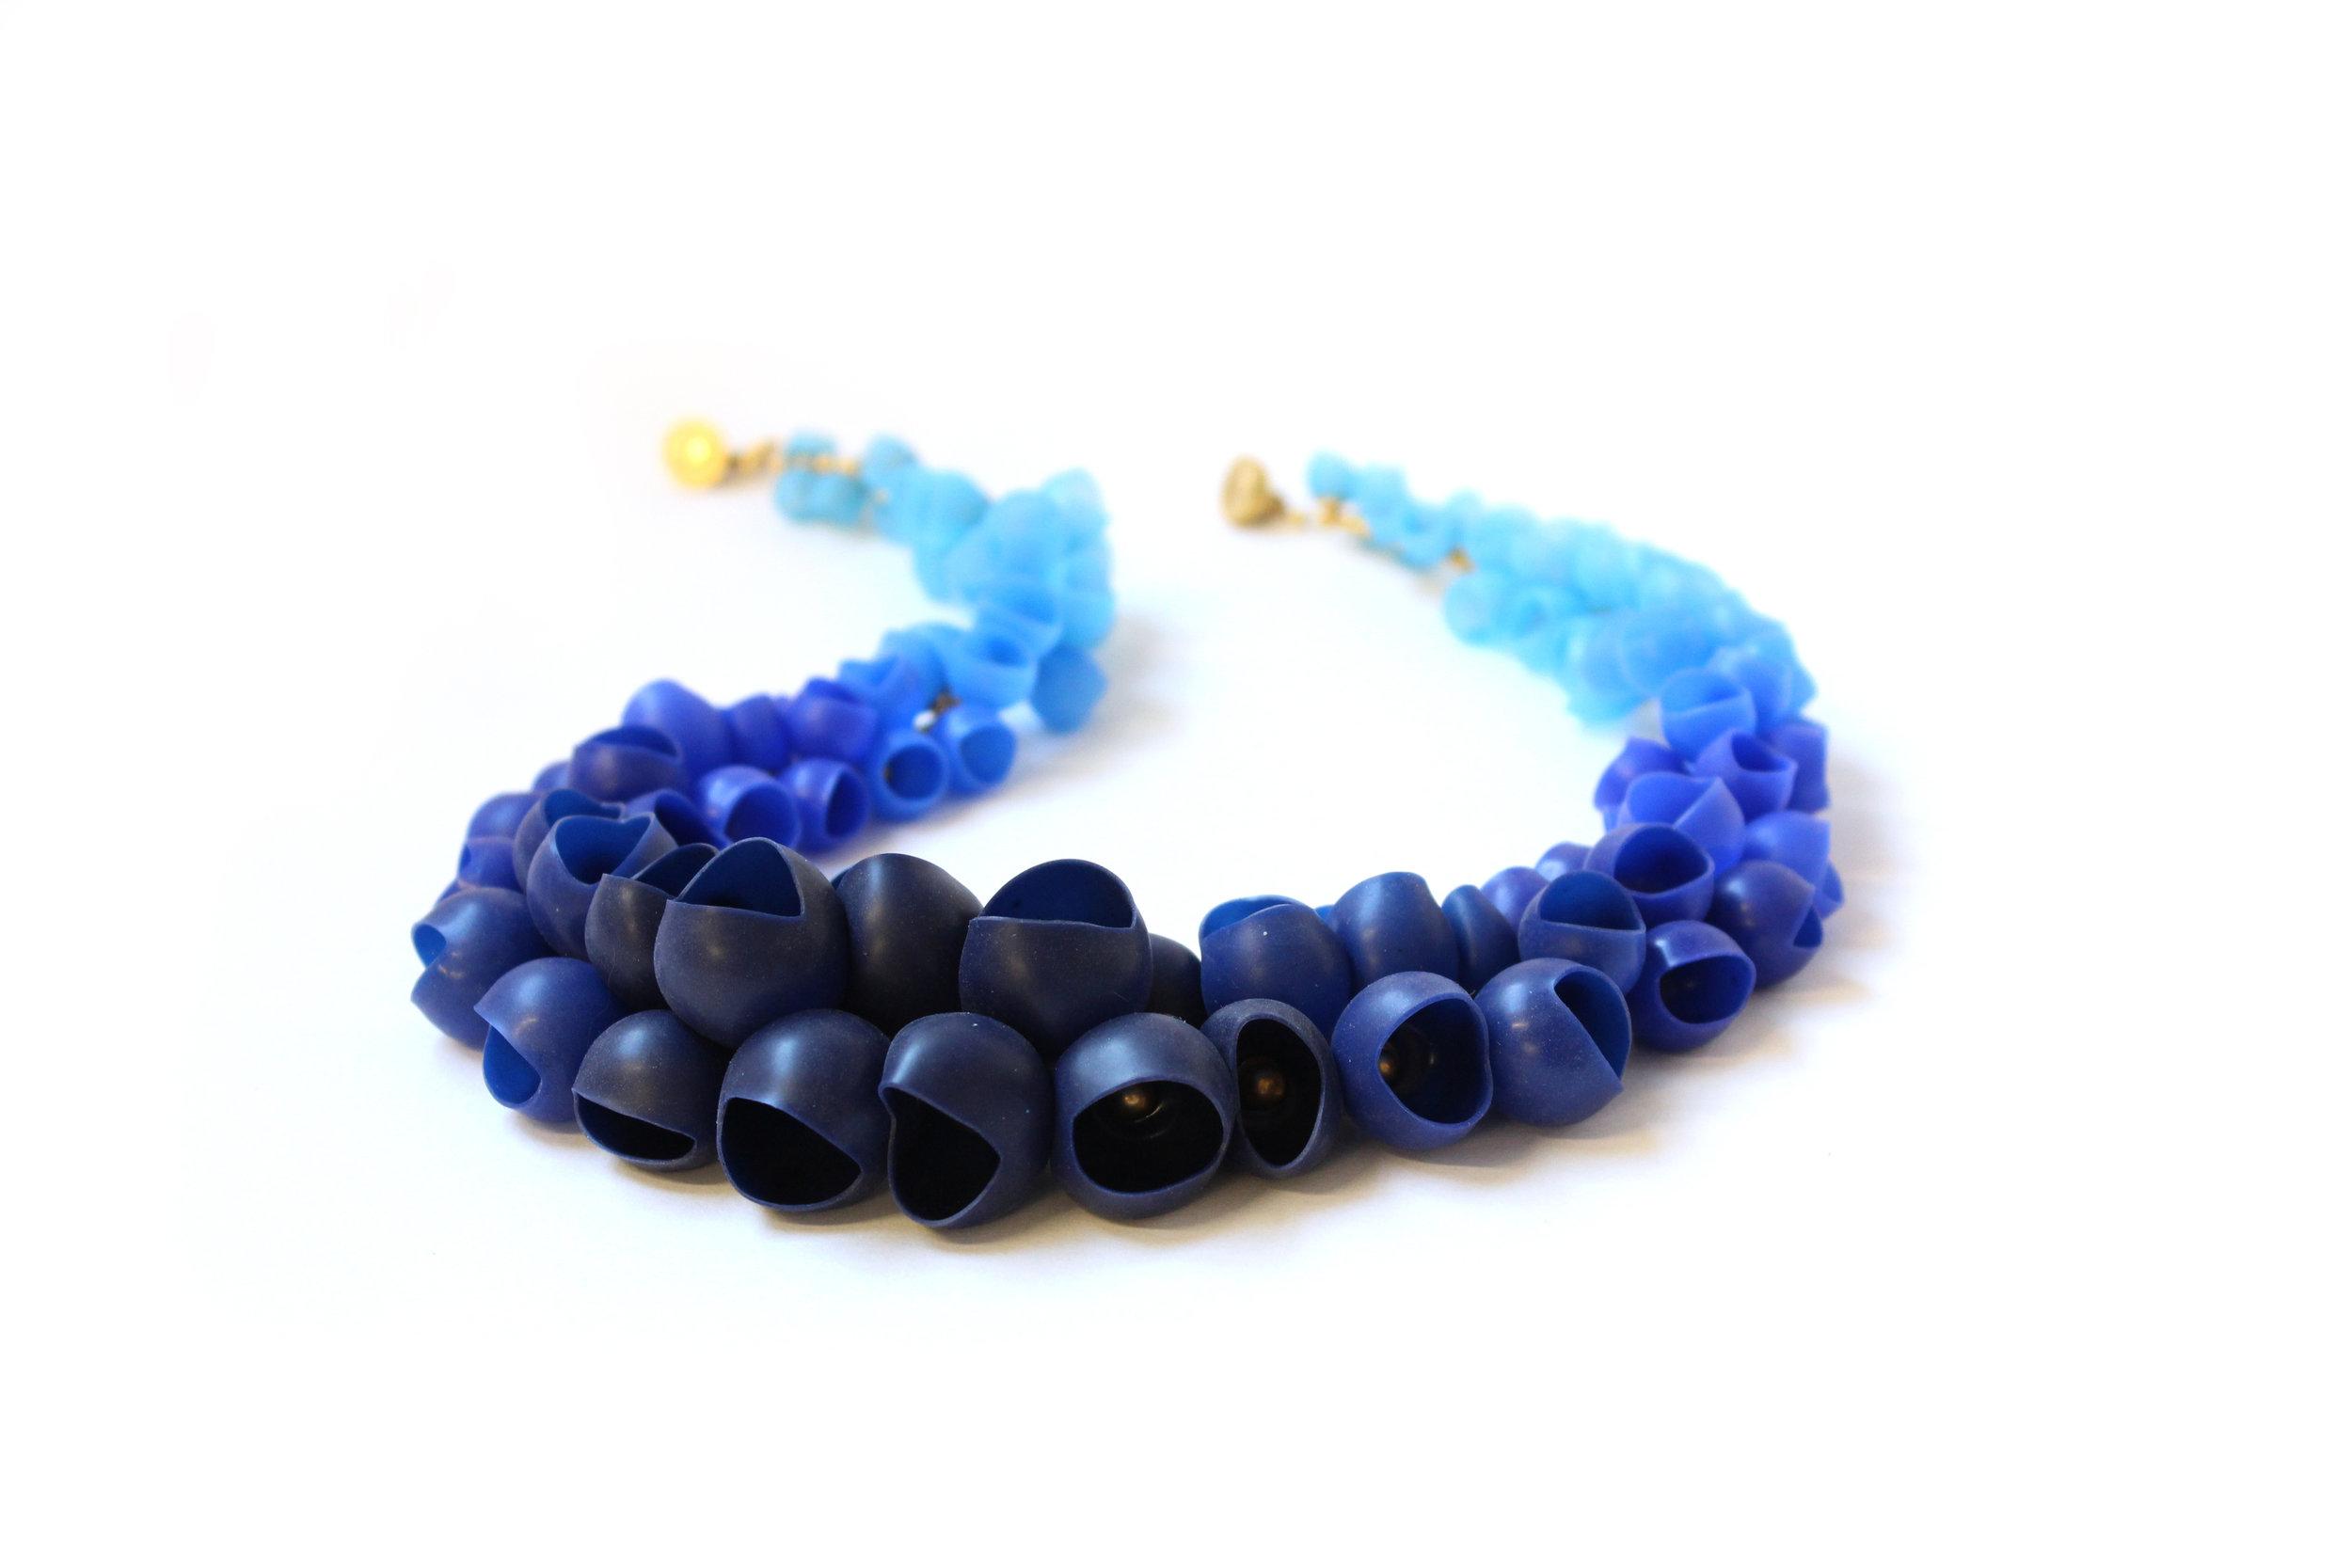 23 Jenny Llewellyn - Plume cluster necklace Navy fade - 300.jpg